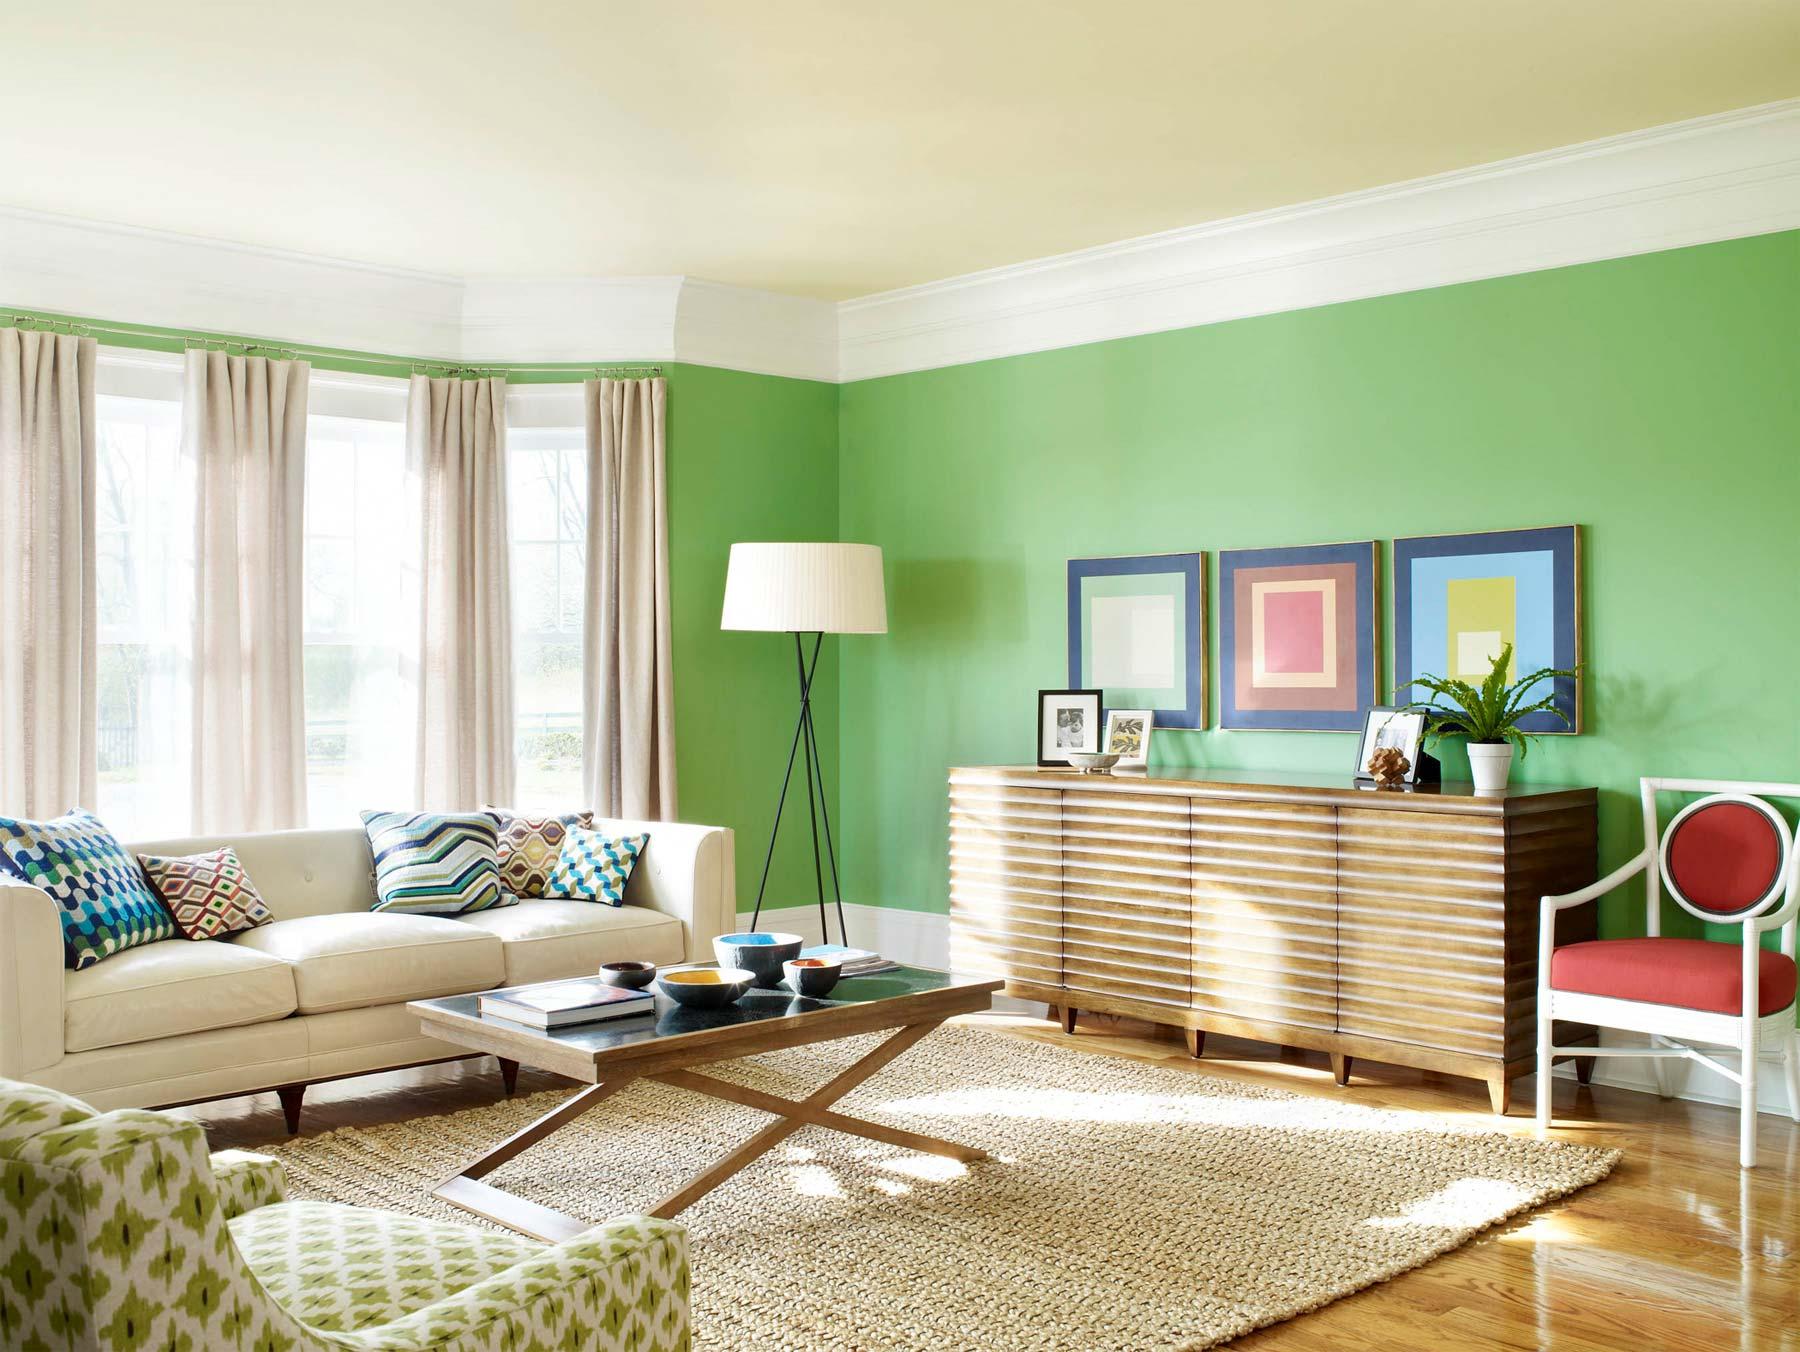 Http://artikel Kesehatan.info/house/interior Designs.html